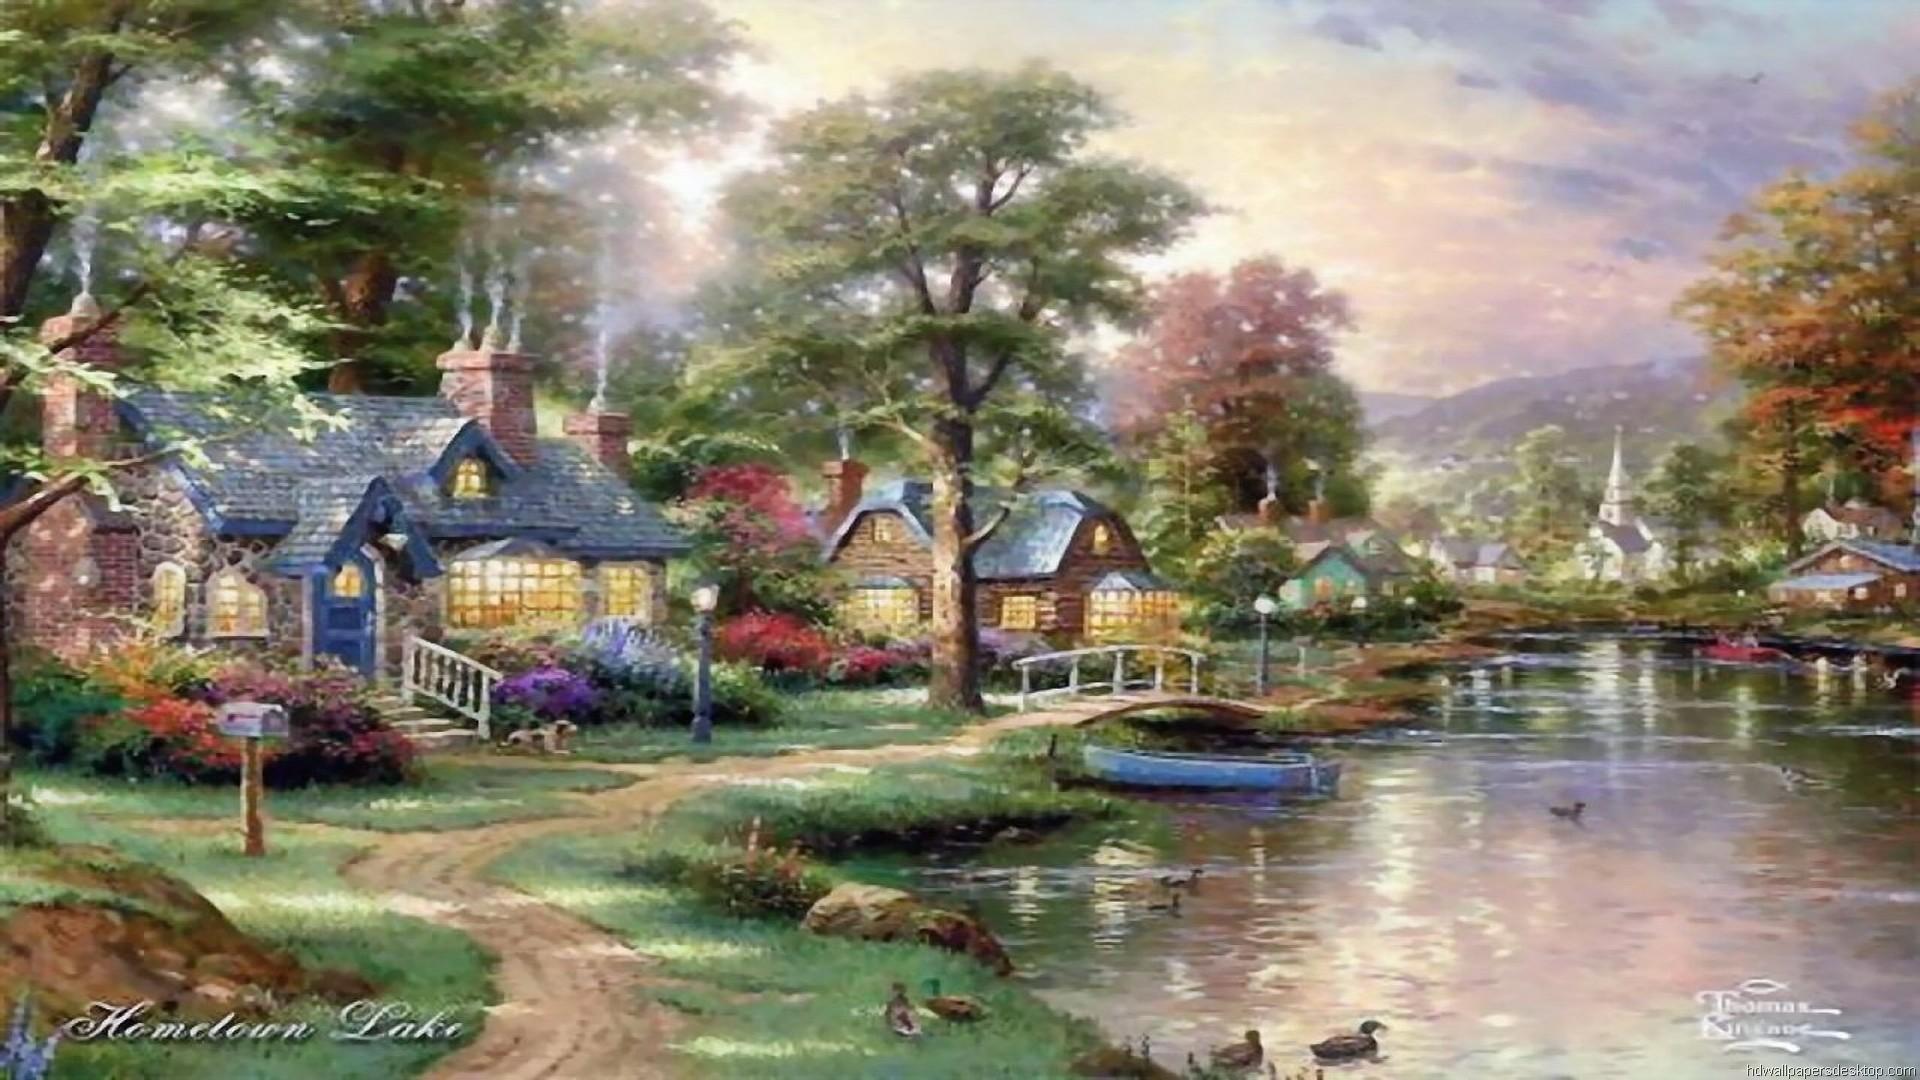 … Thomas Kinkade Wallpaper, Paintings, Art, HD, Desktop, Thomas Kinkade 3  …